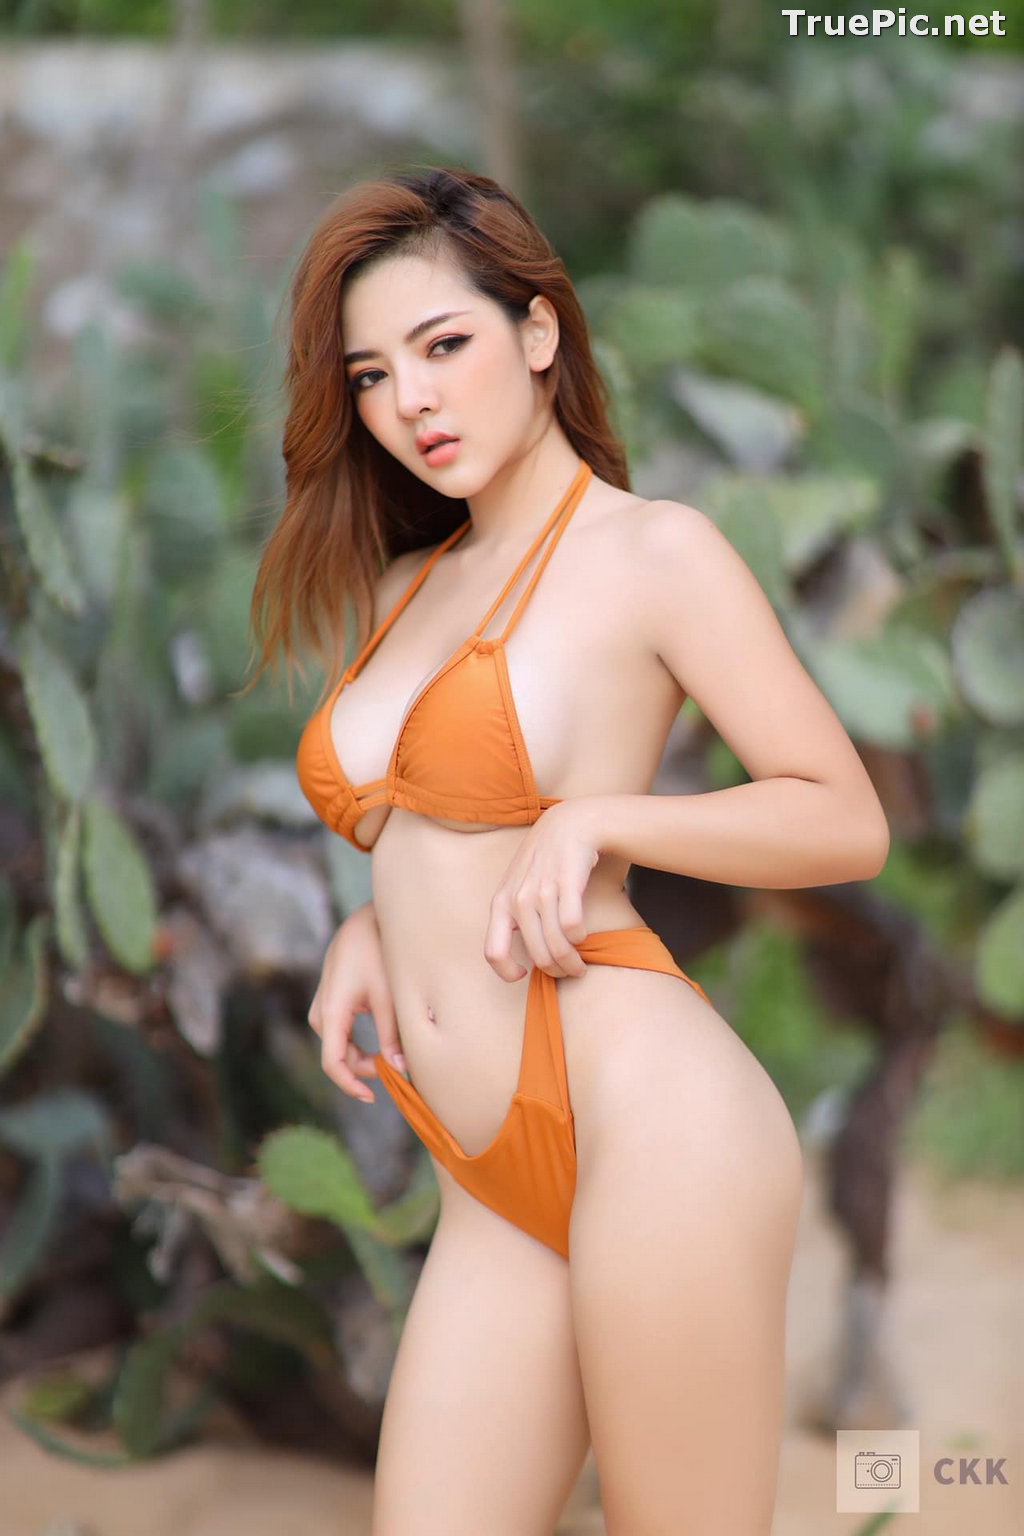 Image Thailand Model - Montakan Kaengraeng - Sexy Orange Bikini - TruePic.net - Picture-7